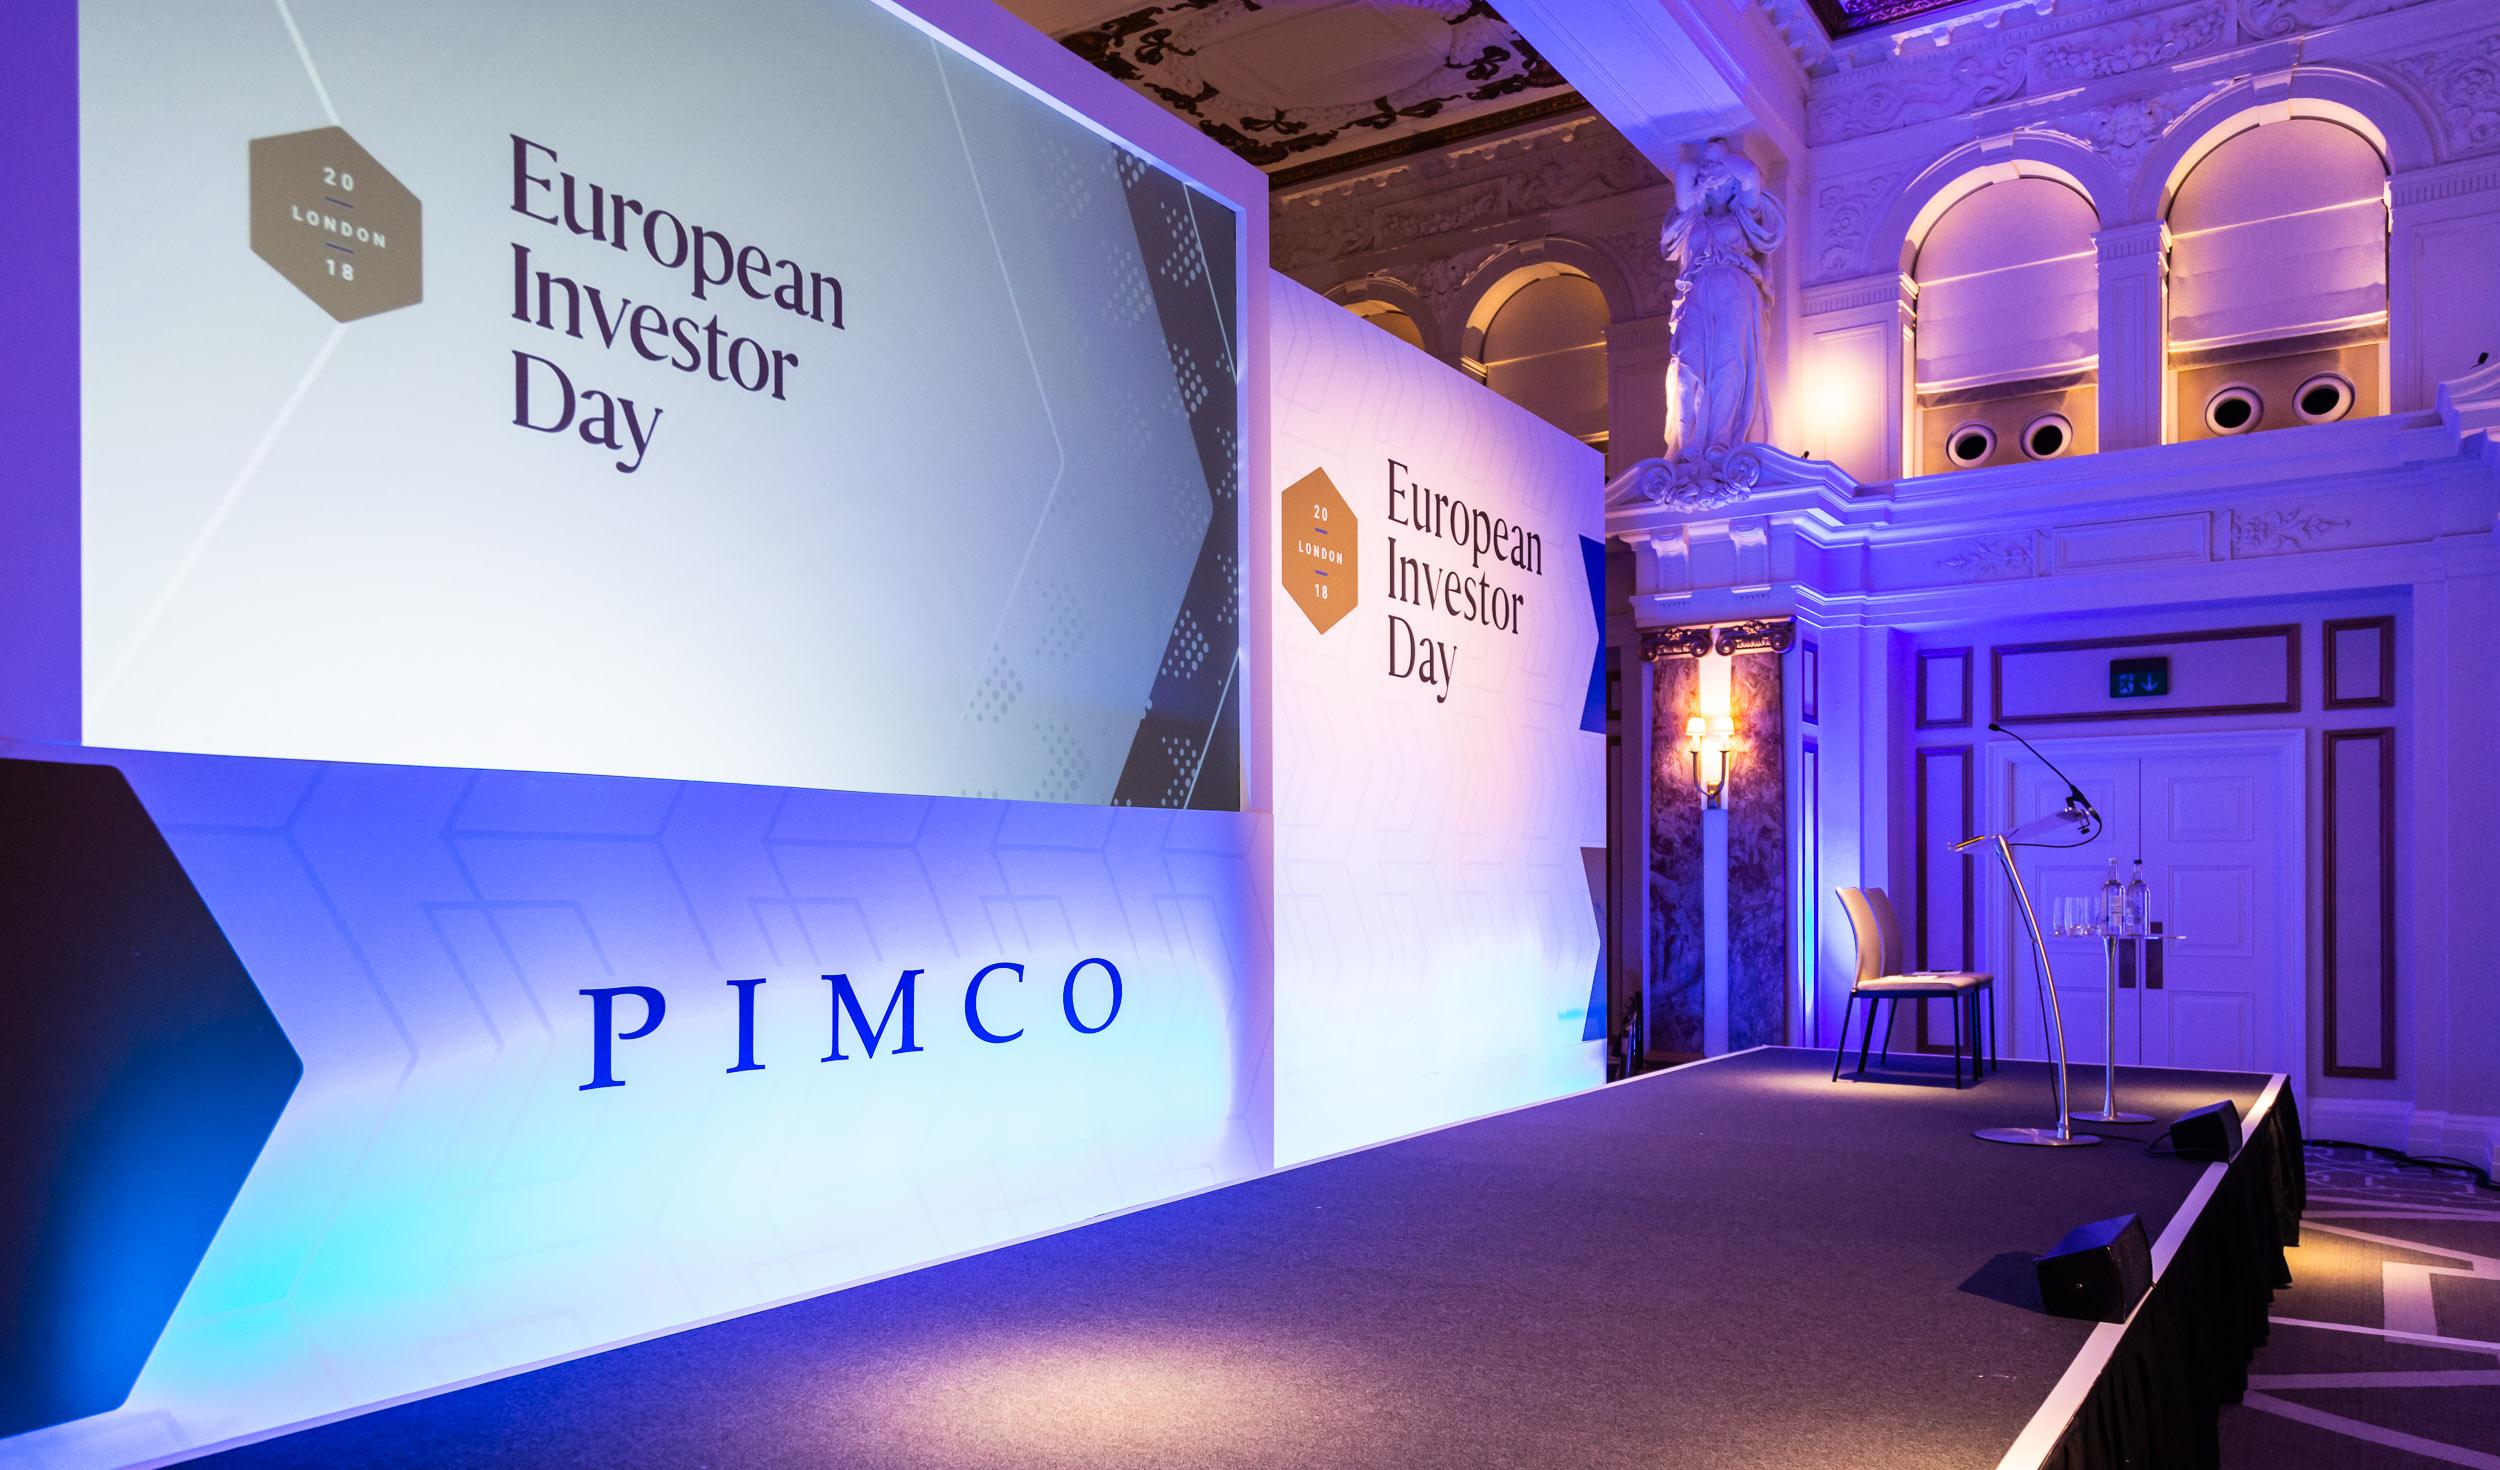 Pimco Investor Day - 2018